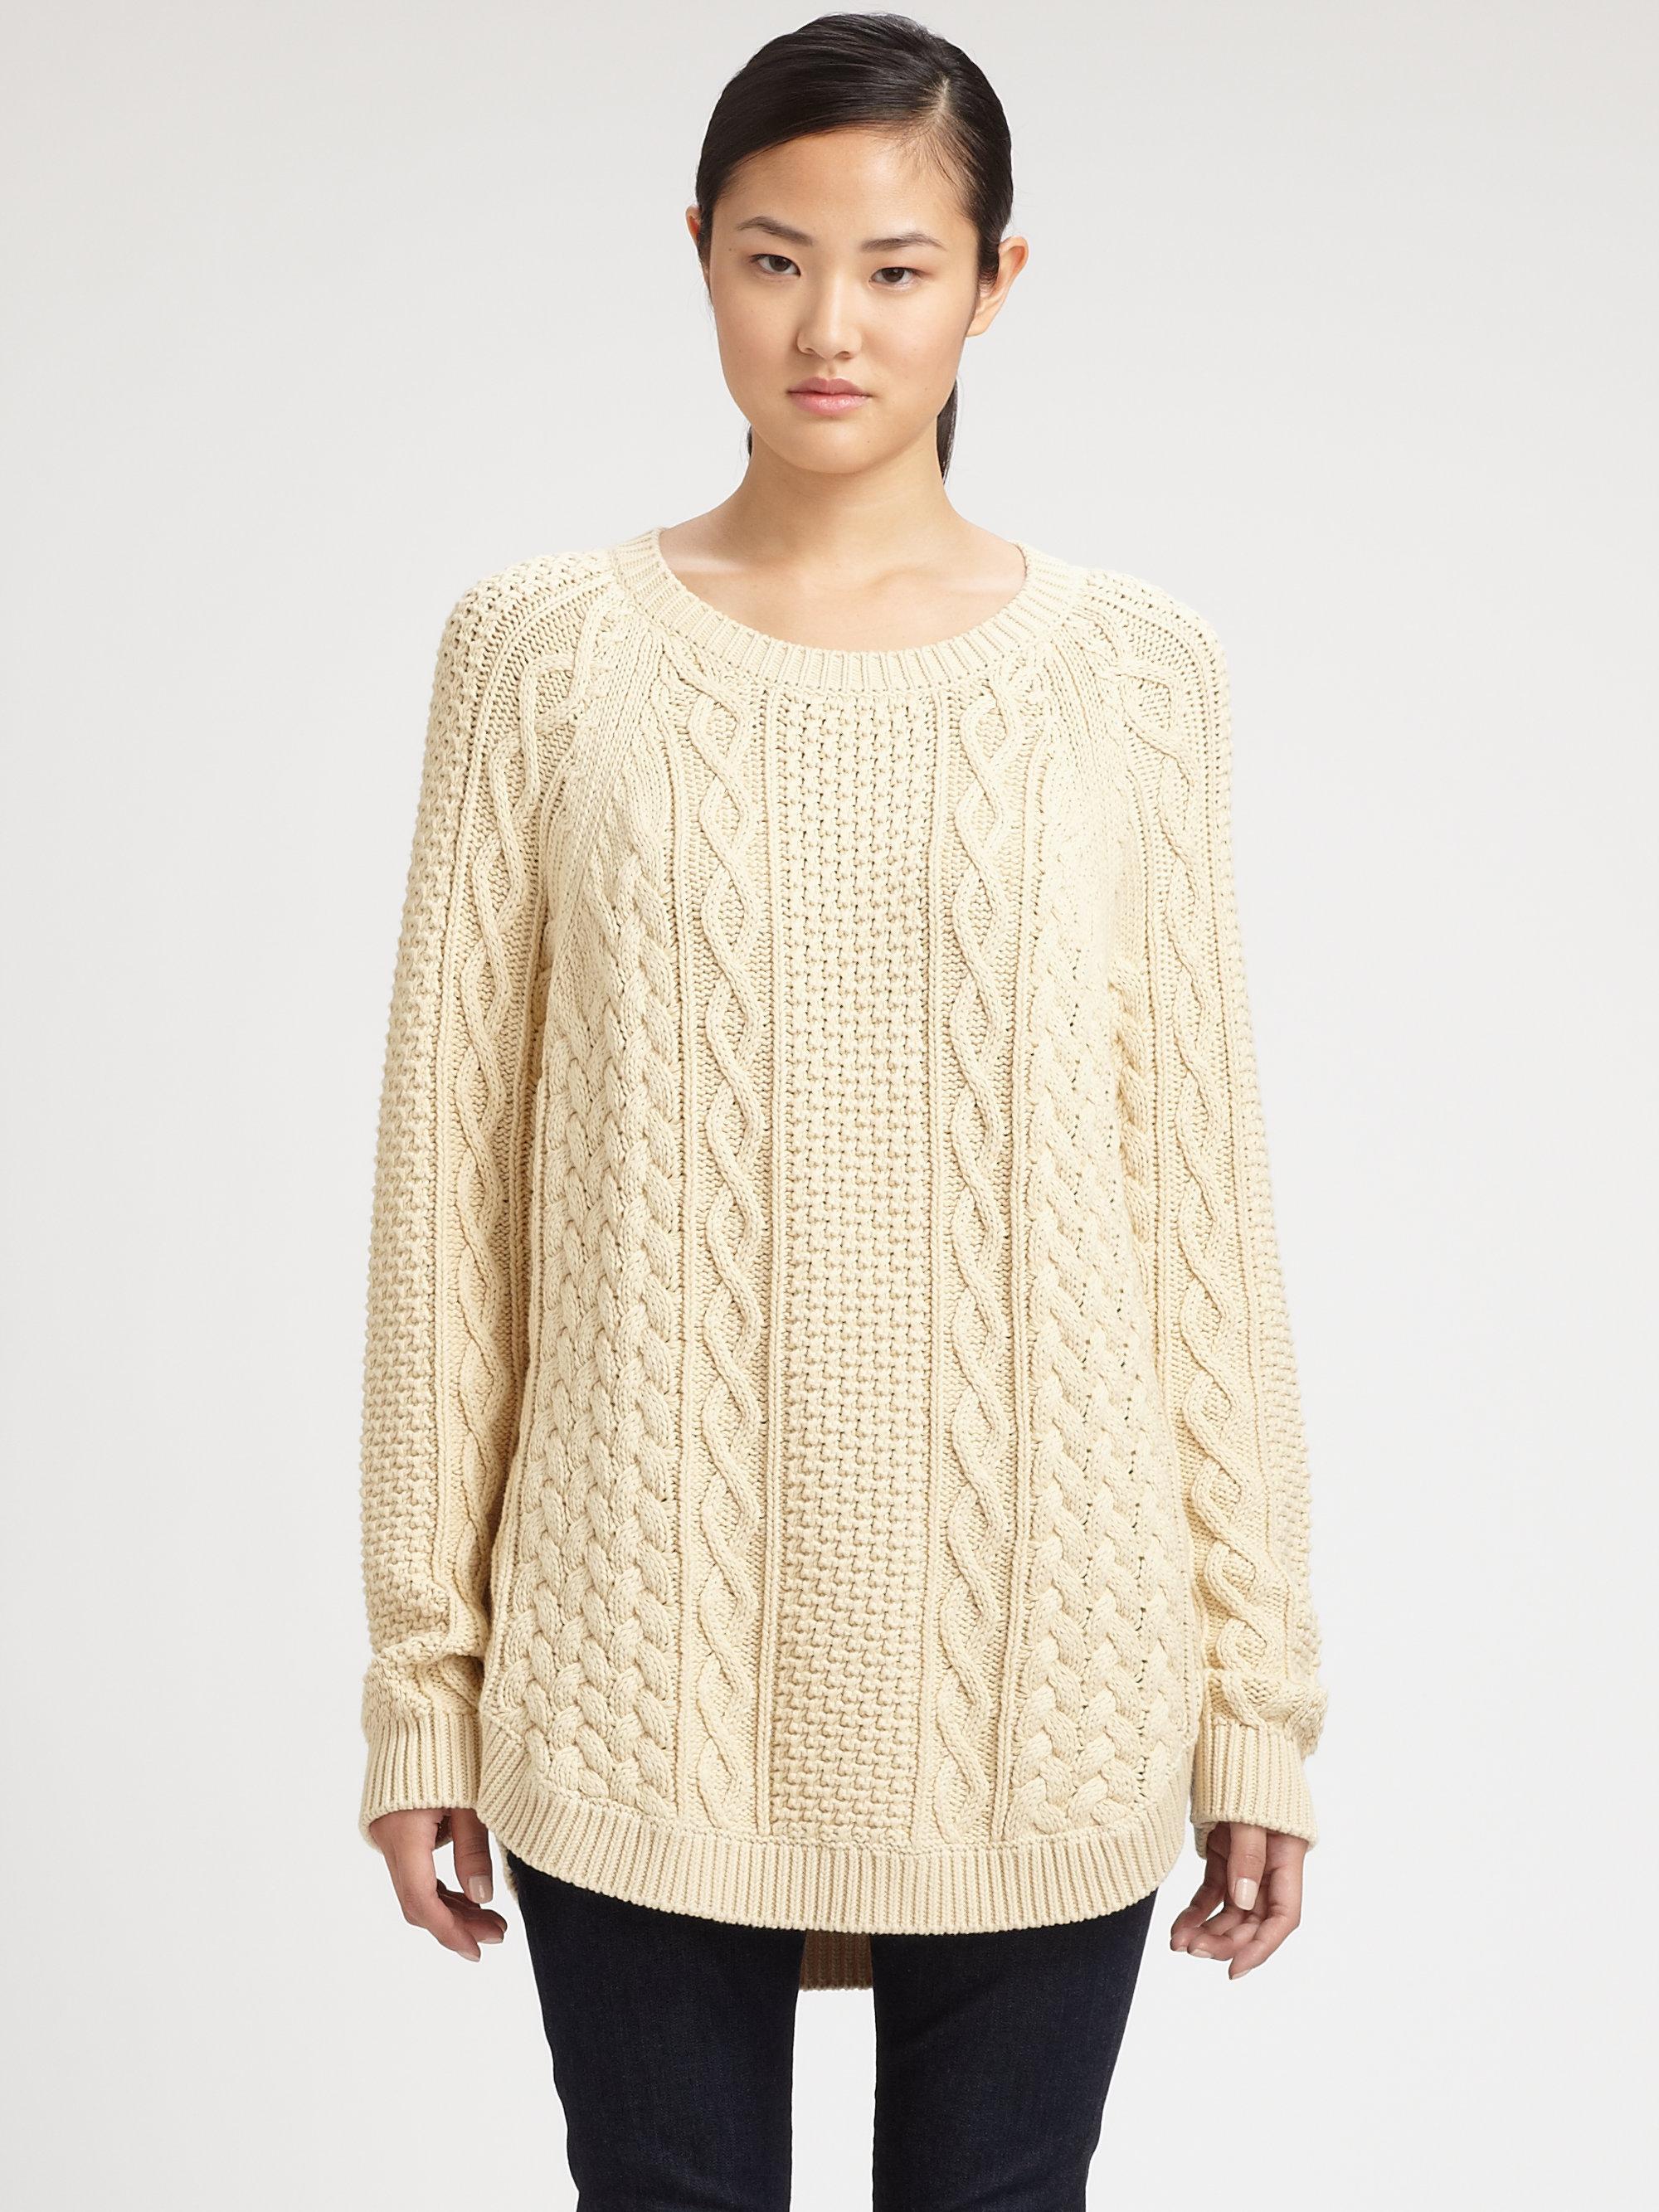 e058de8c3 MICHAEL Michael Kors Fisherman Cableknit Sweater in Natural - Lyst